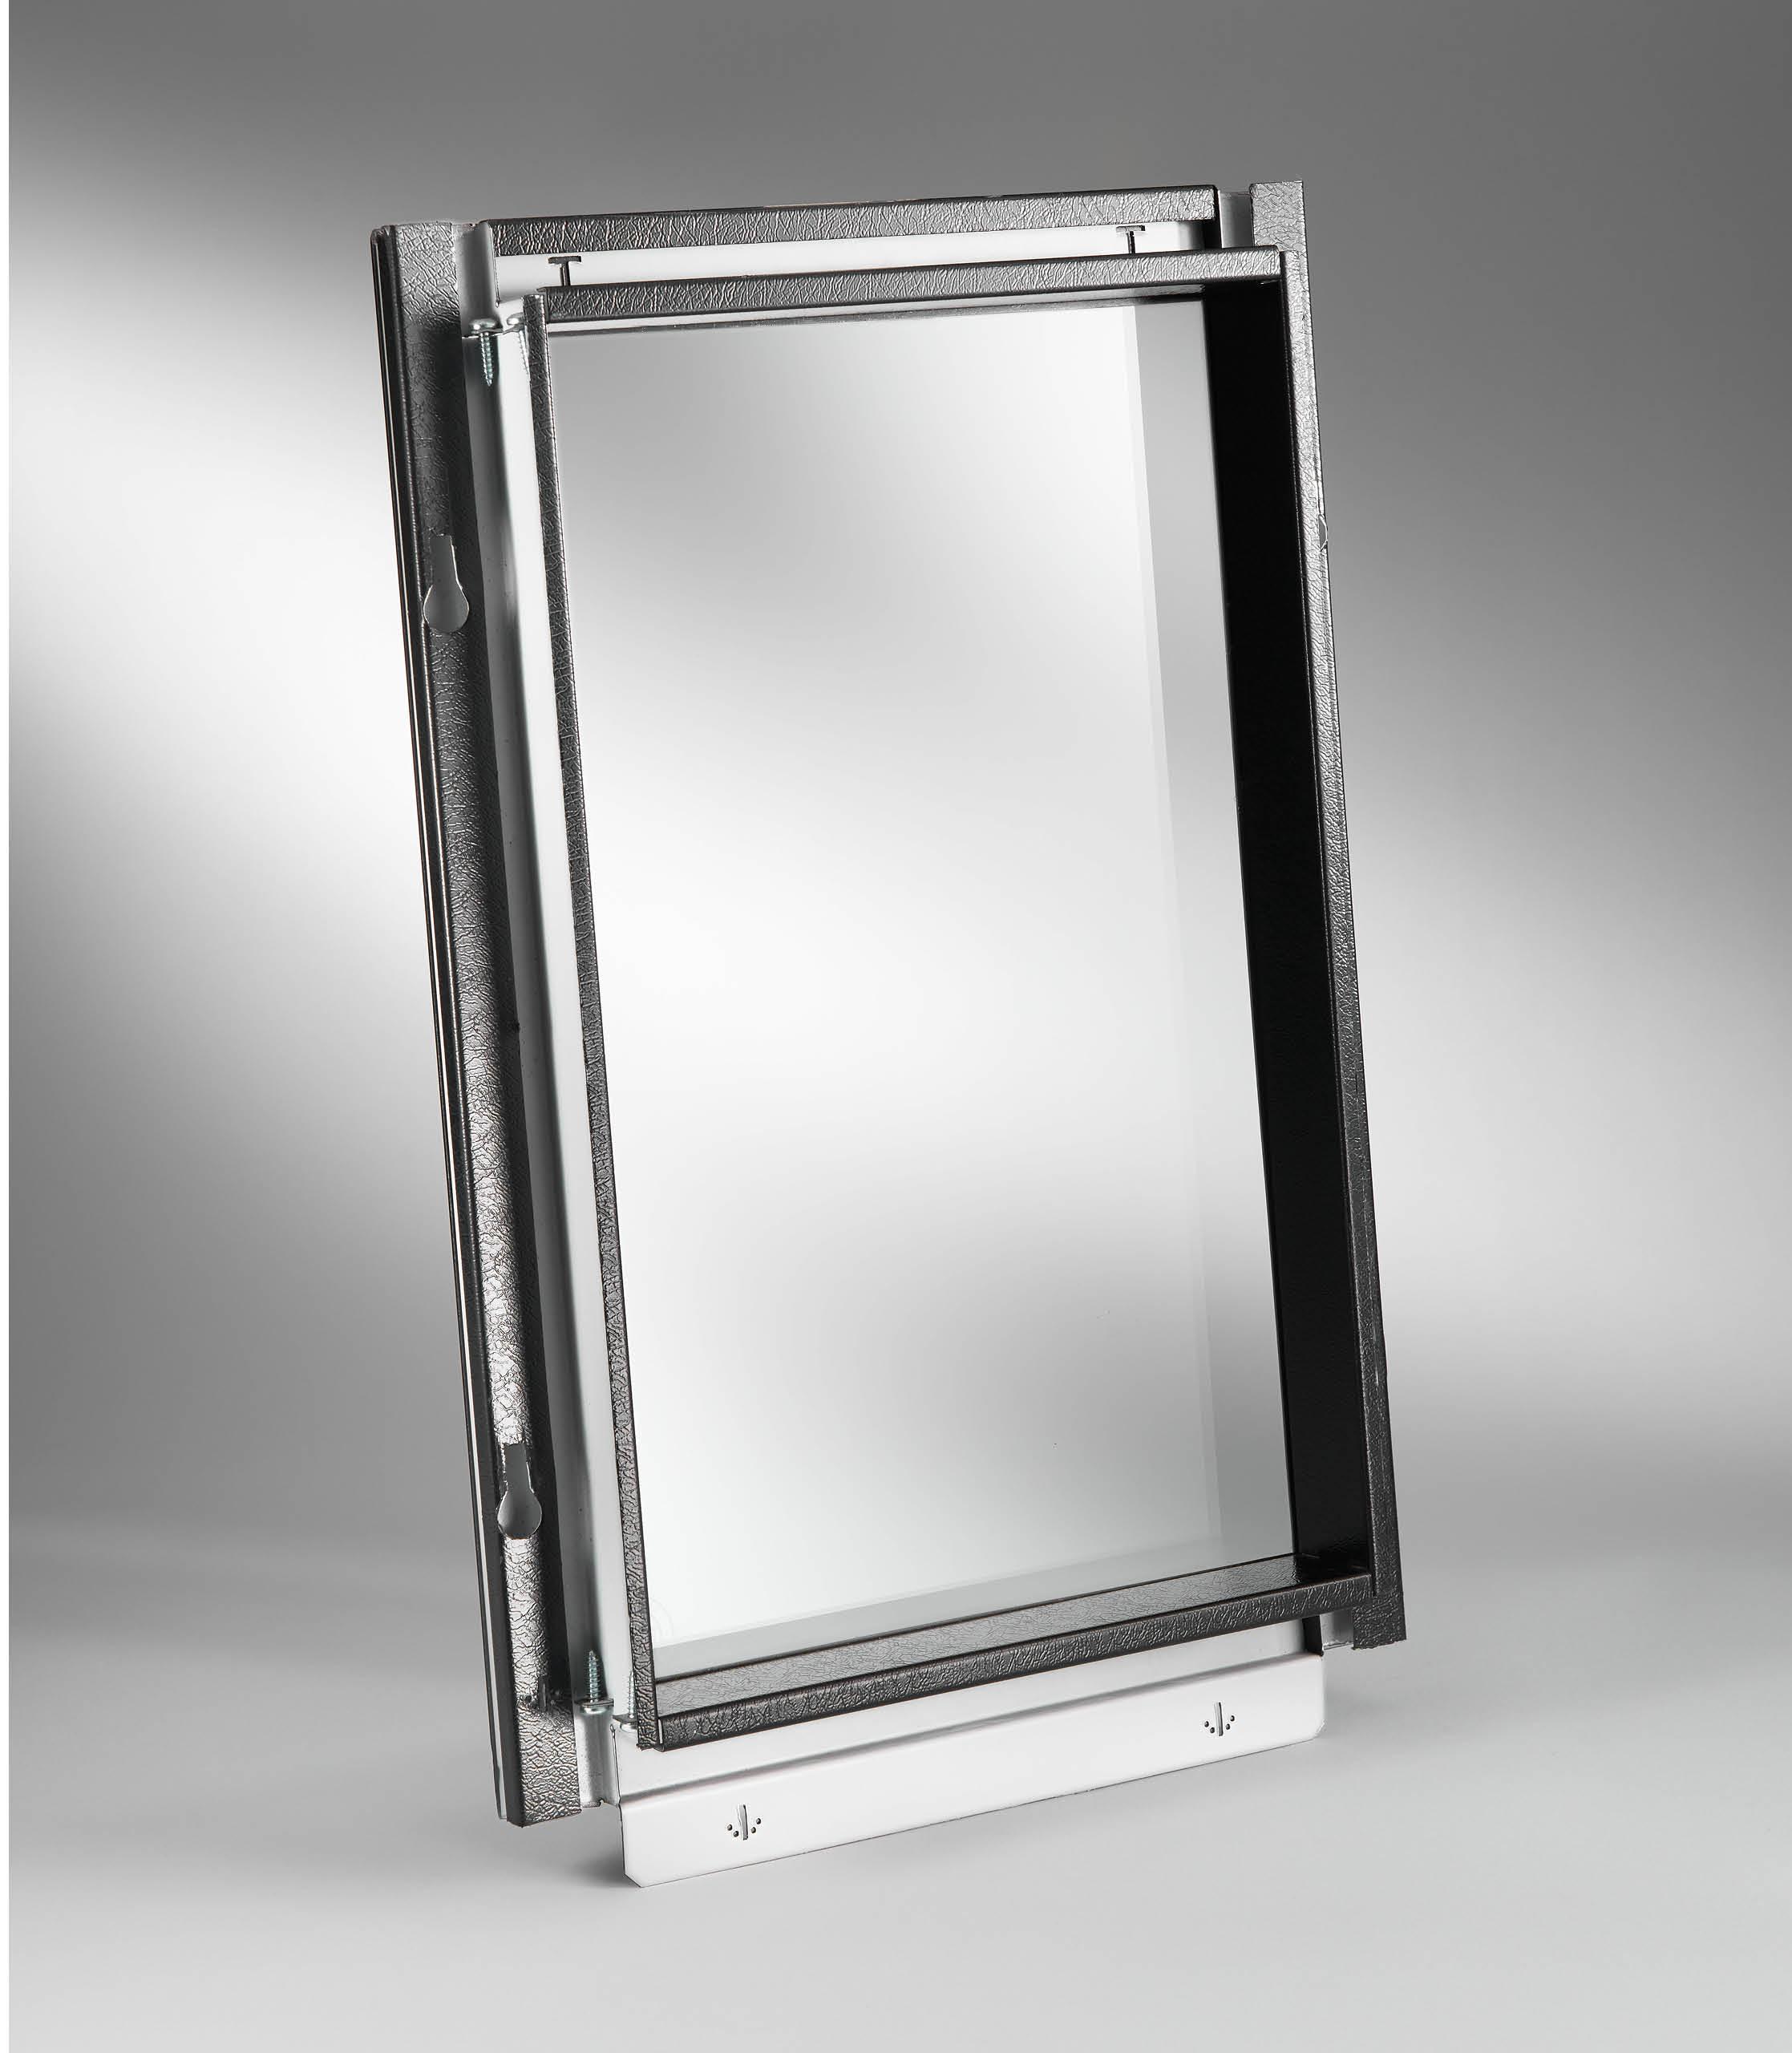 Glazed partition2